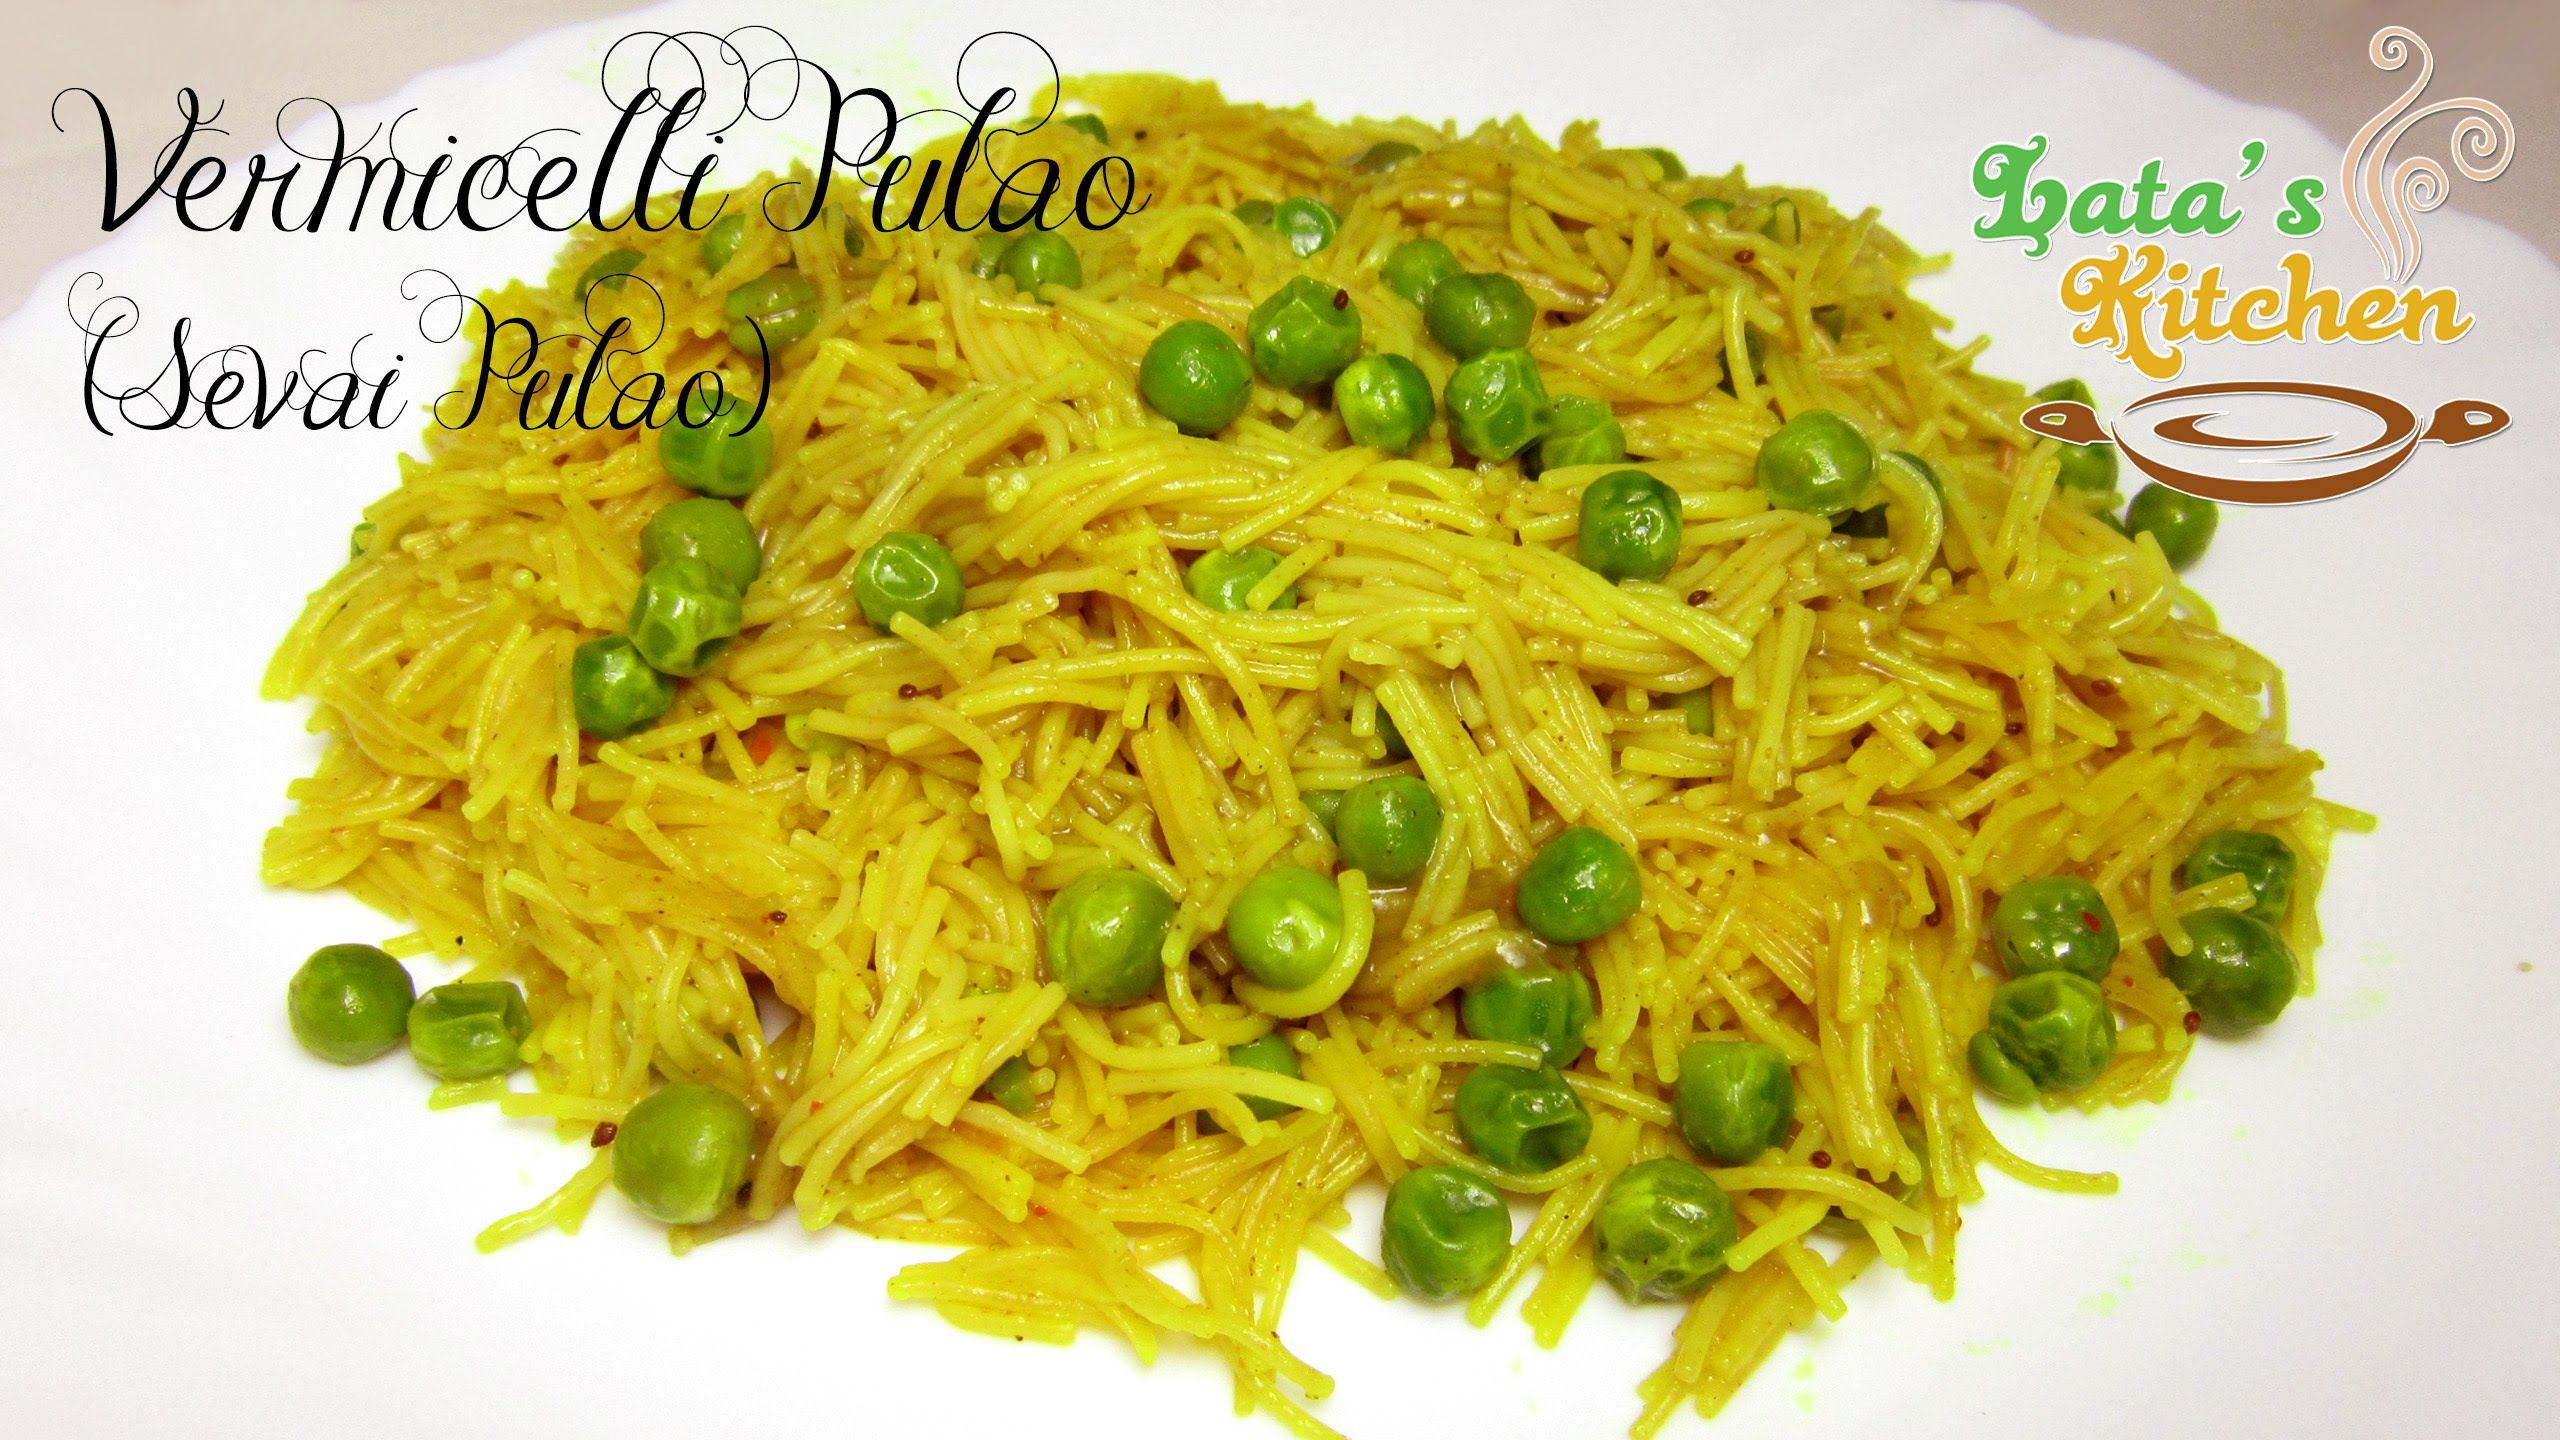 Vermicelli pulao semiya upma indian vegetarian recipe in hindi vermicelli pulao semiya upma indian vegetarian recipe in hindi with english subtitles forumfinder Choice Image